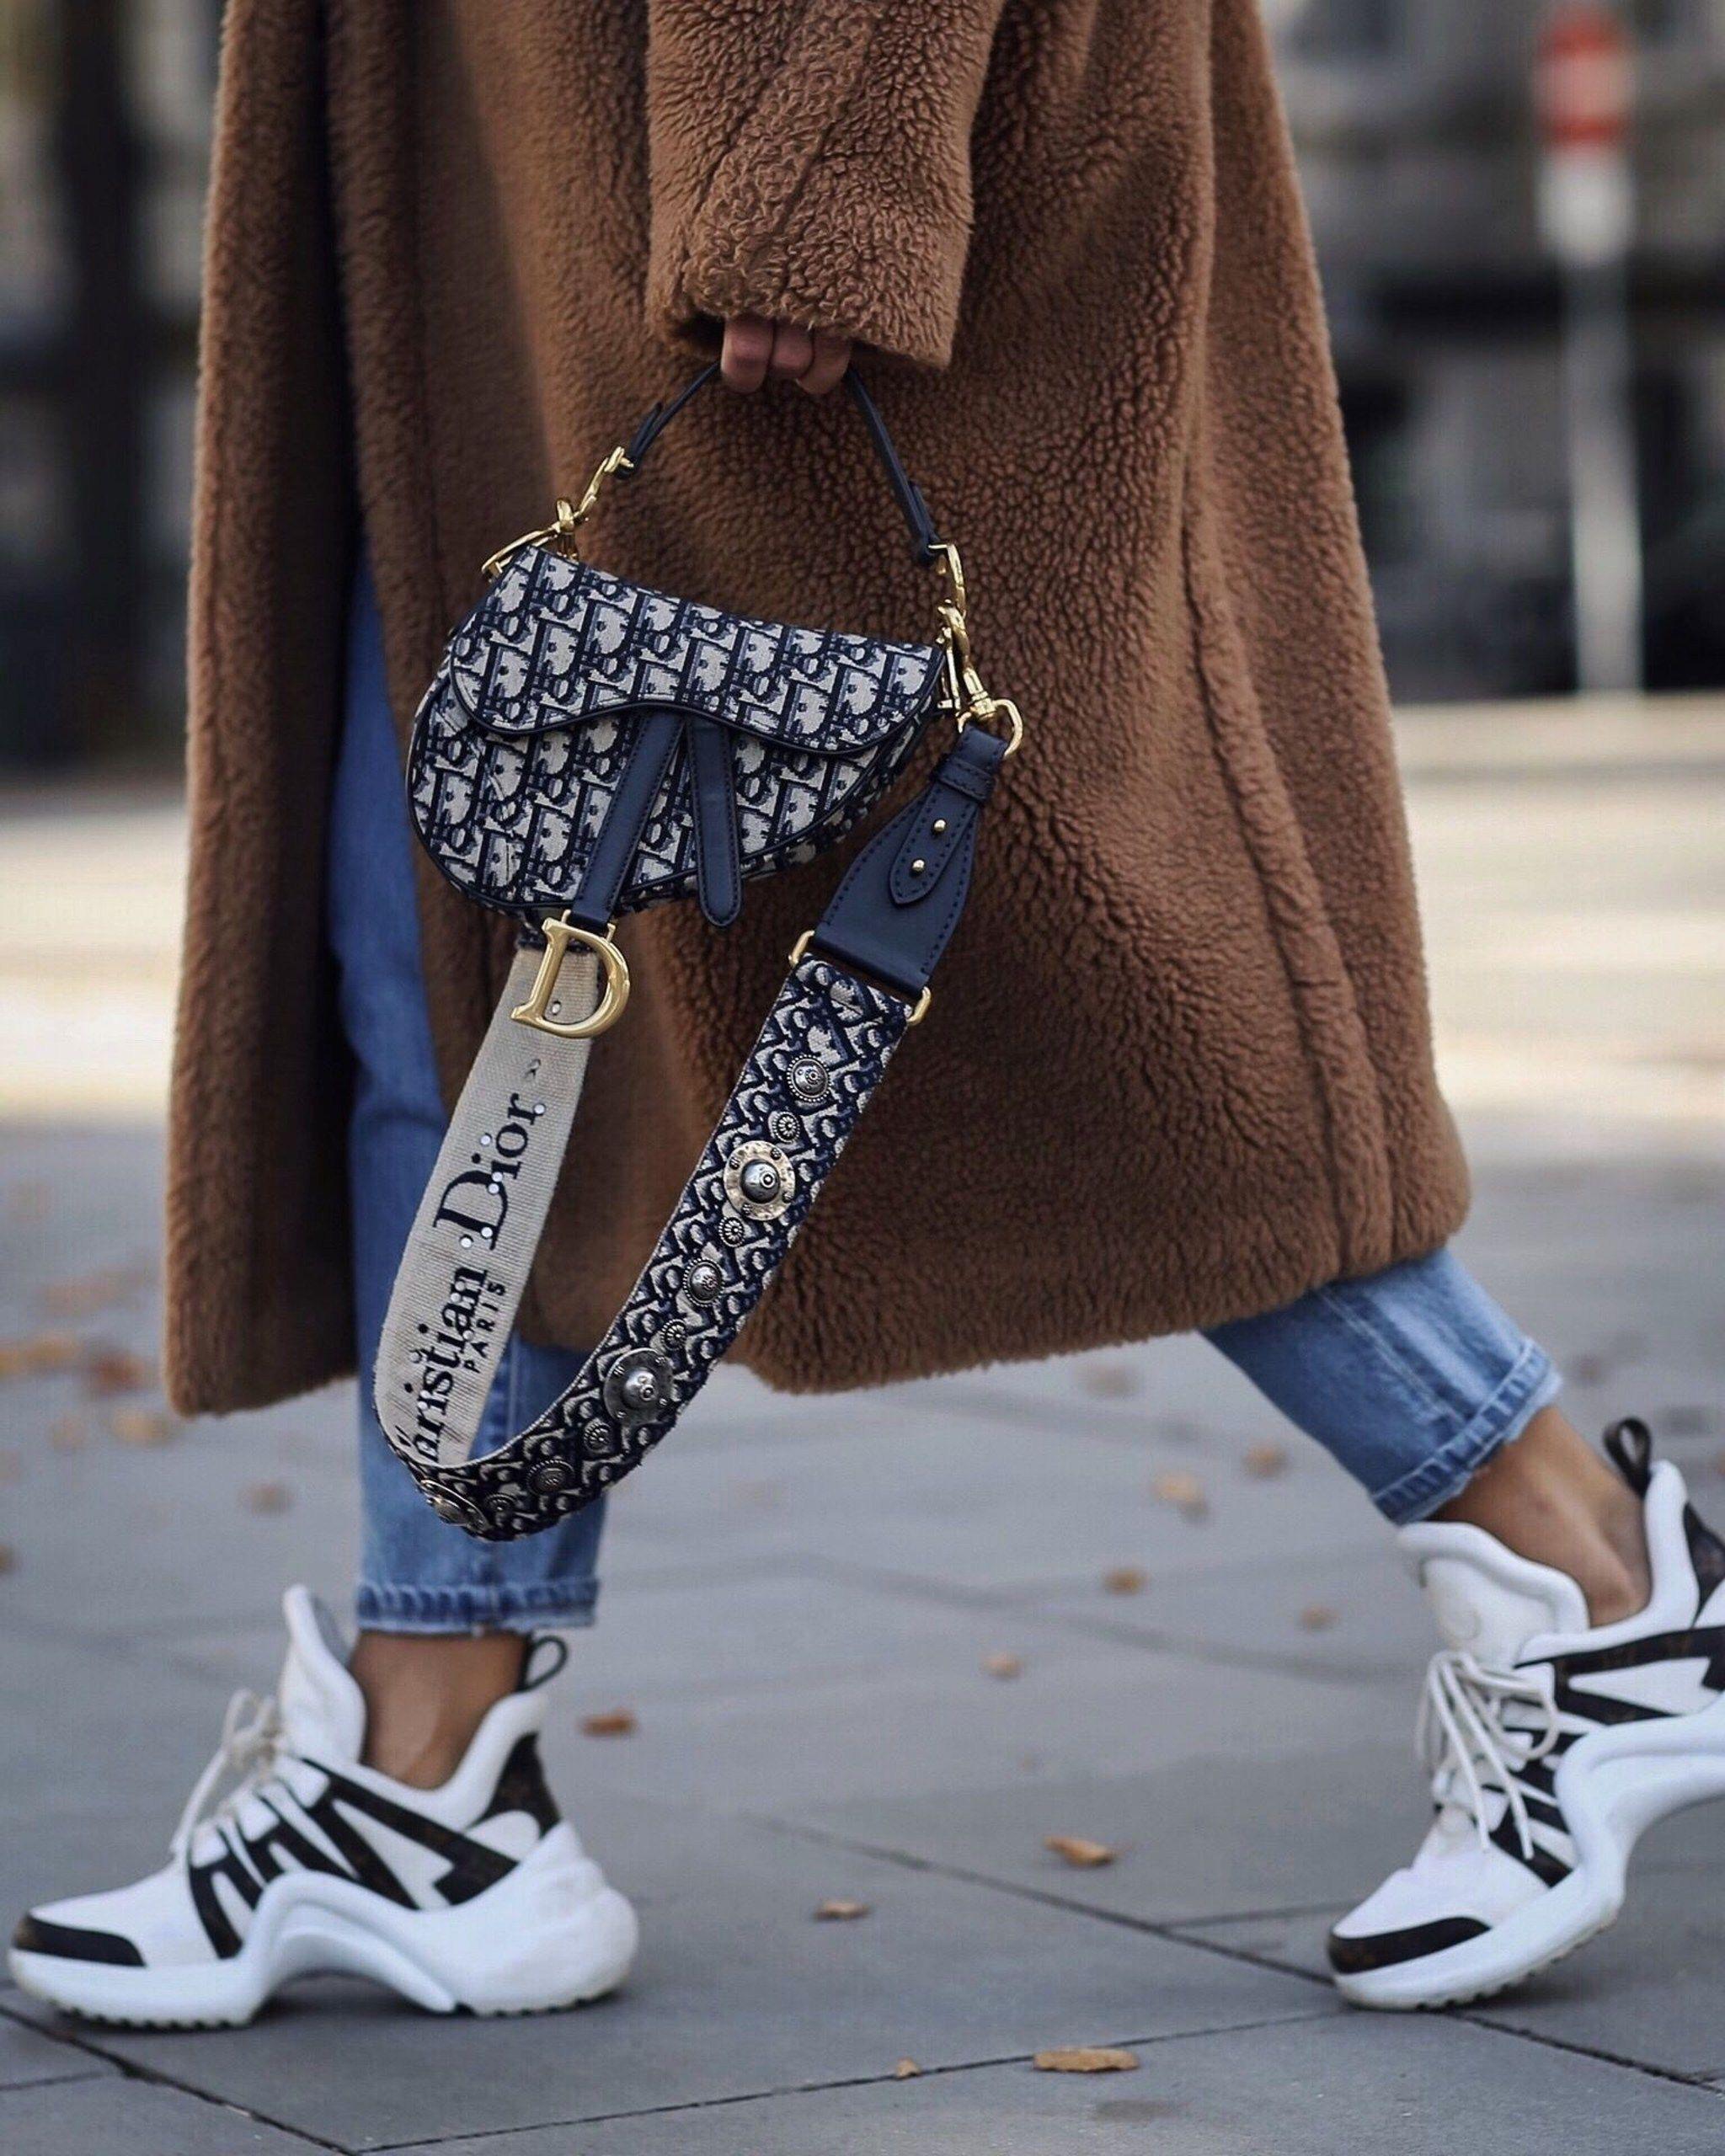 Bags | Tassen | Designer Bag | Dior | Saddle Bag | Louis Vuitton | LV | Sneakers... 11